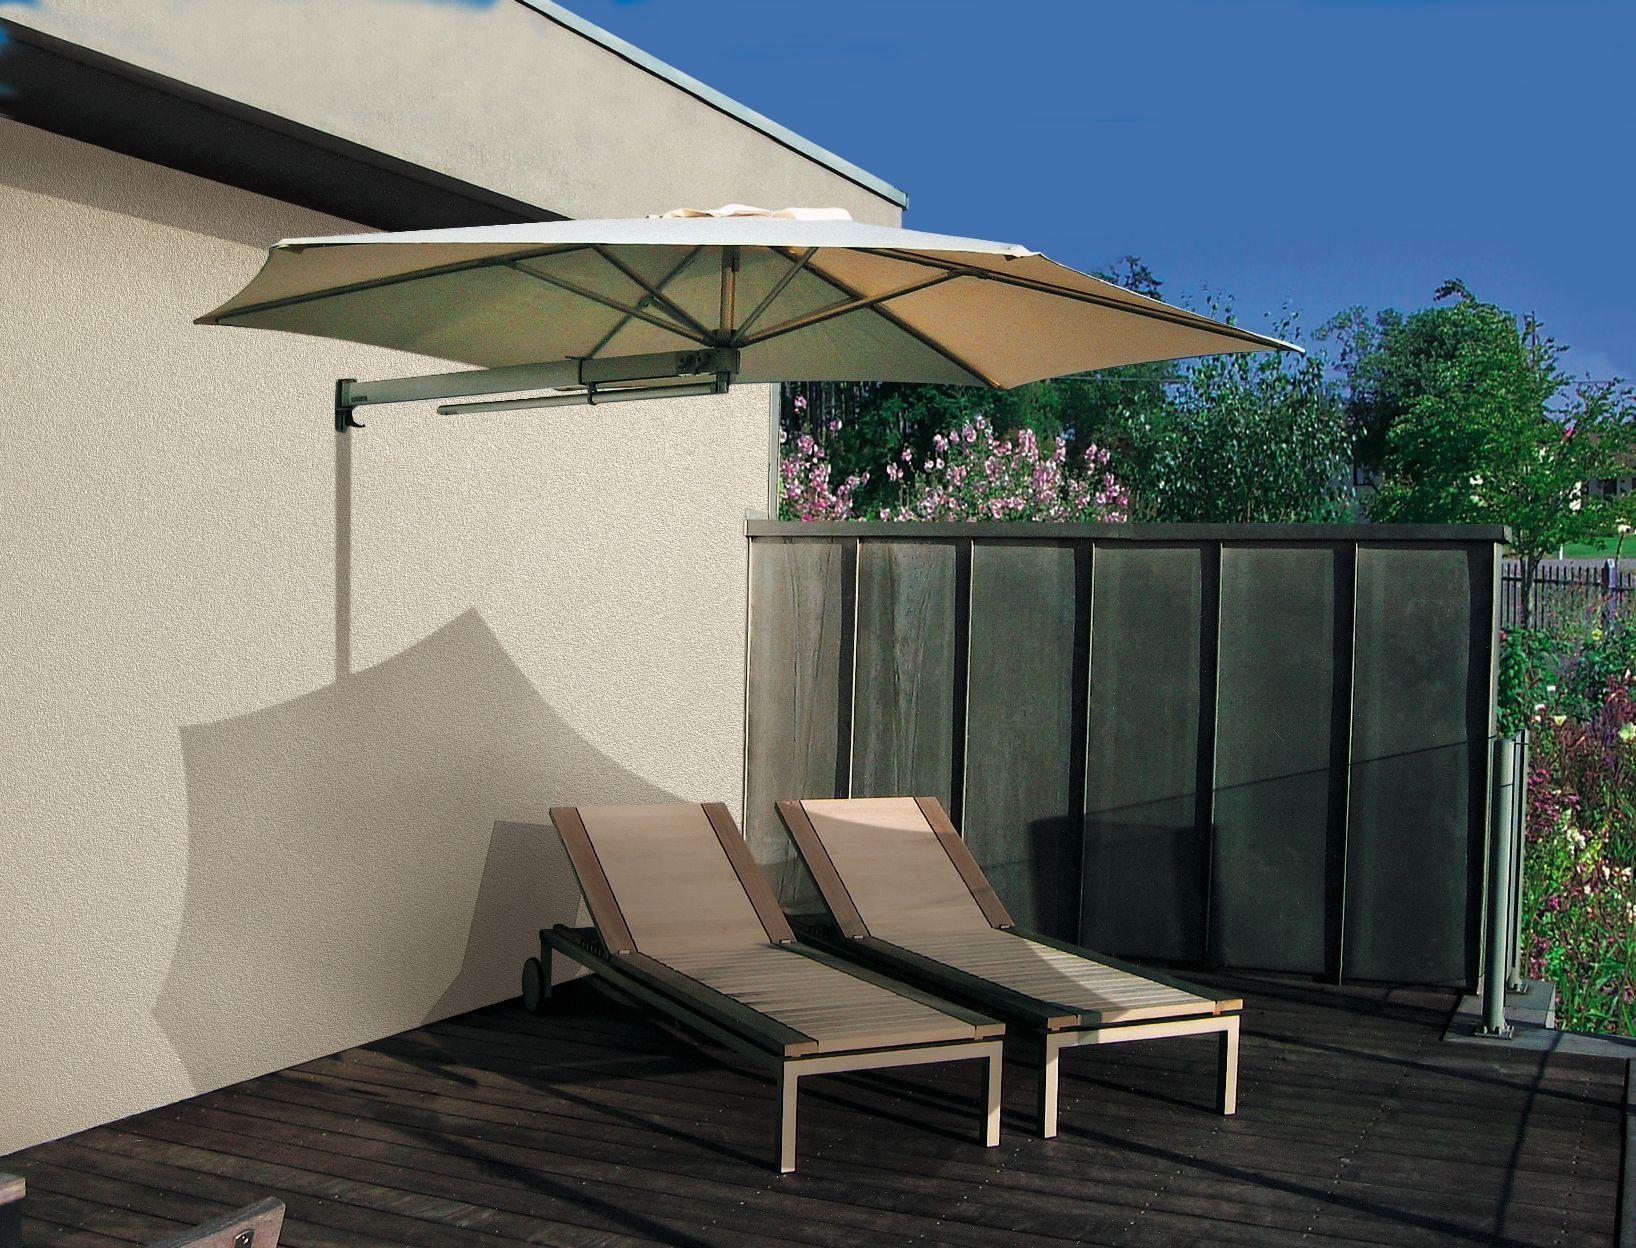 Wall Mounted Patio Umbrella Gartenschirme Terassenideen Sonnenschirm Terrasse